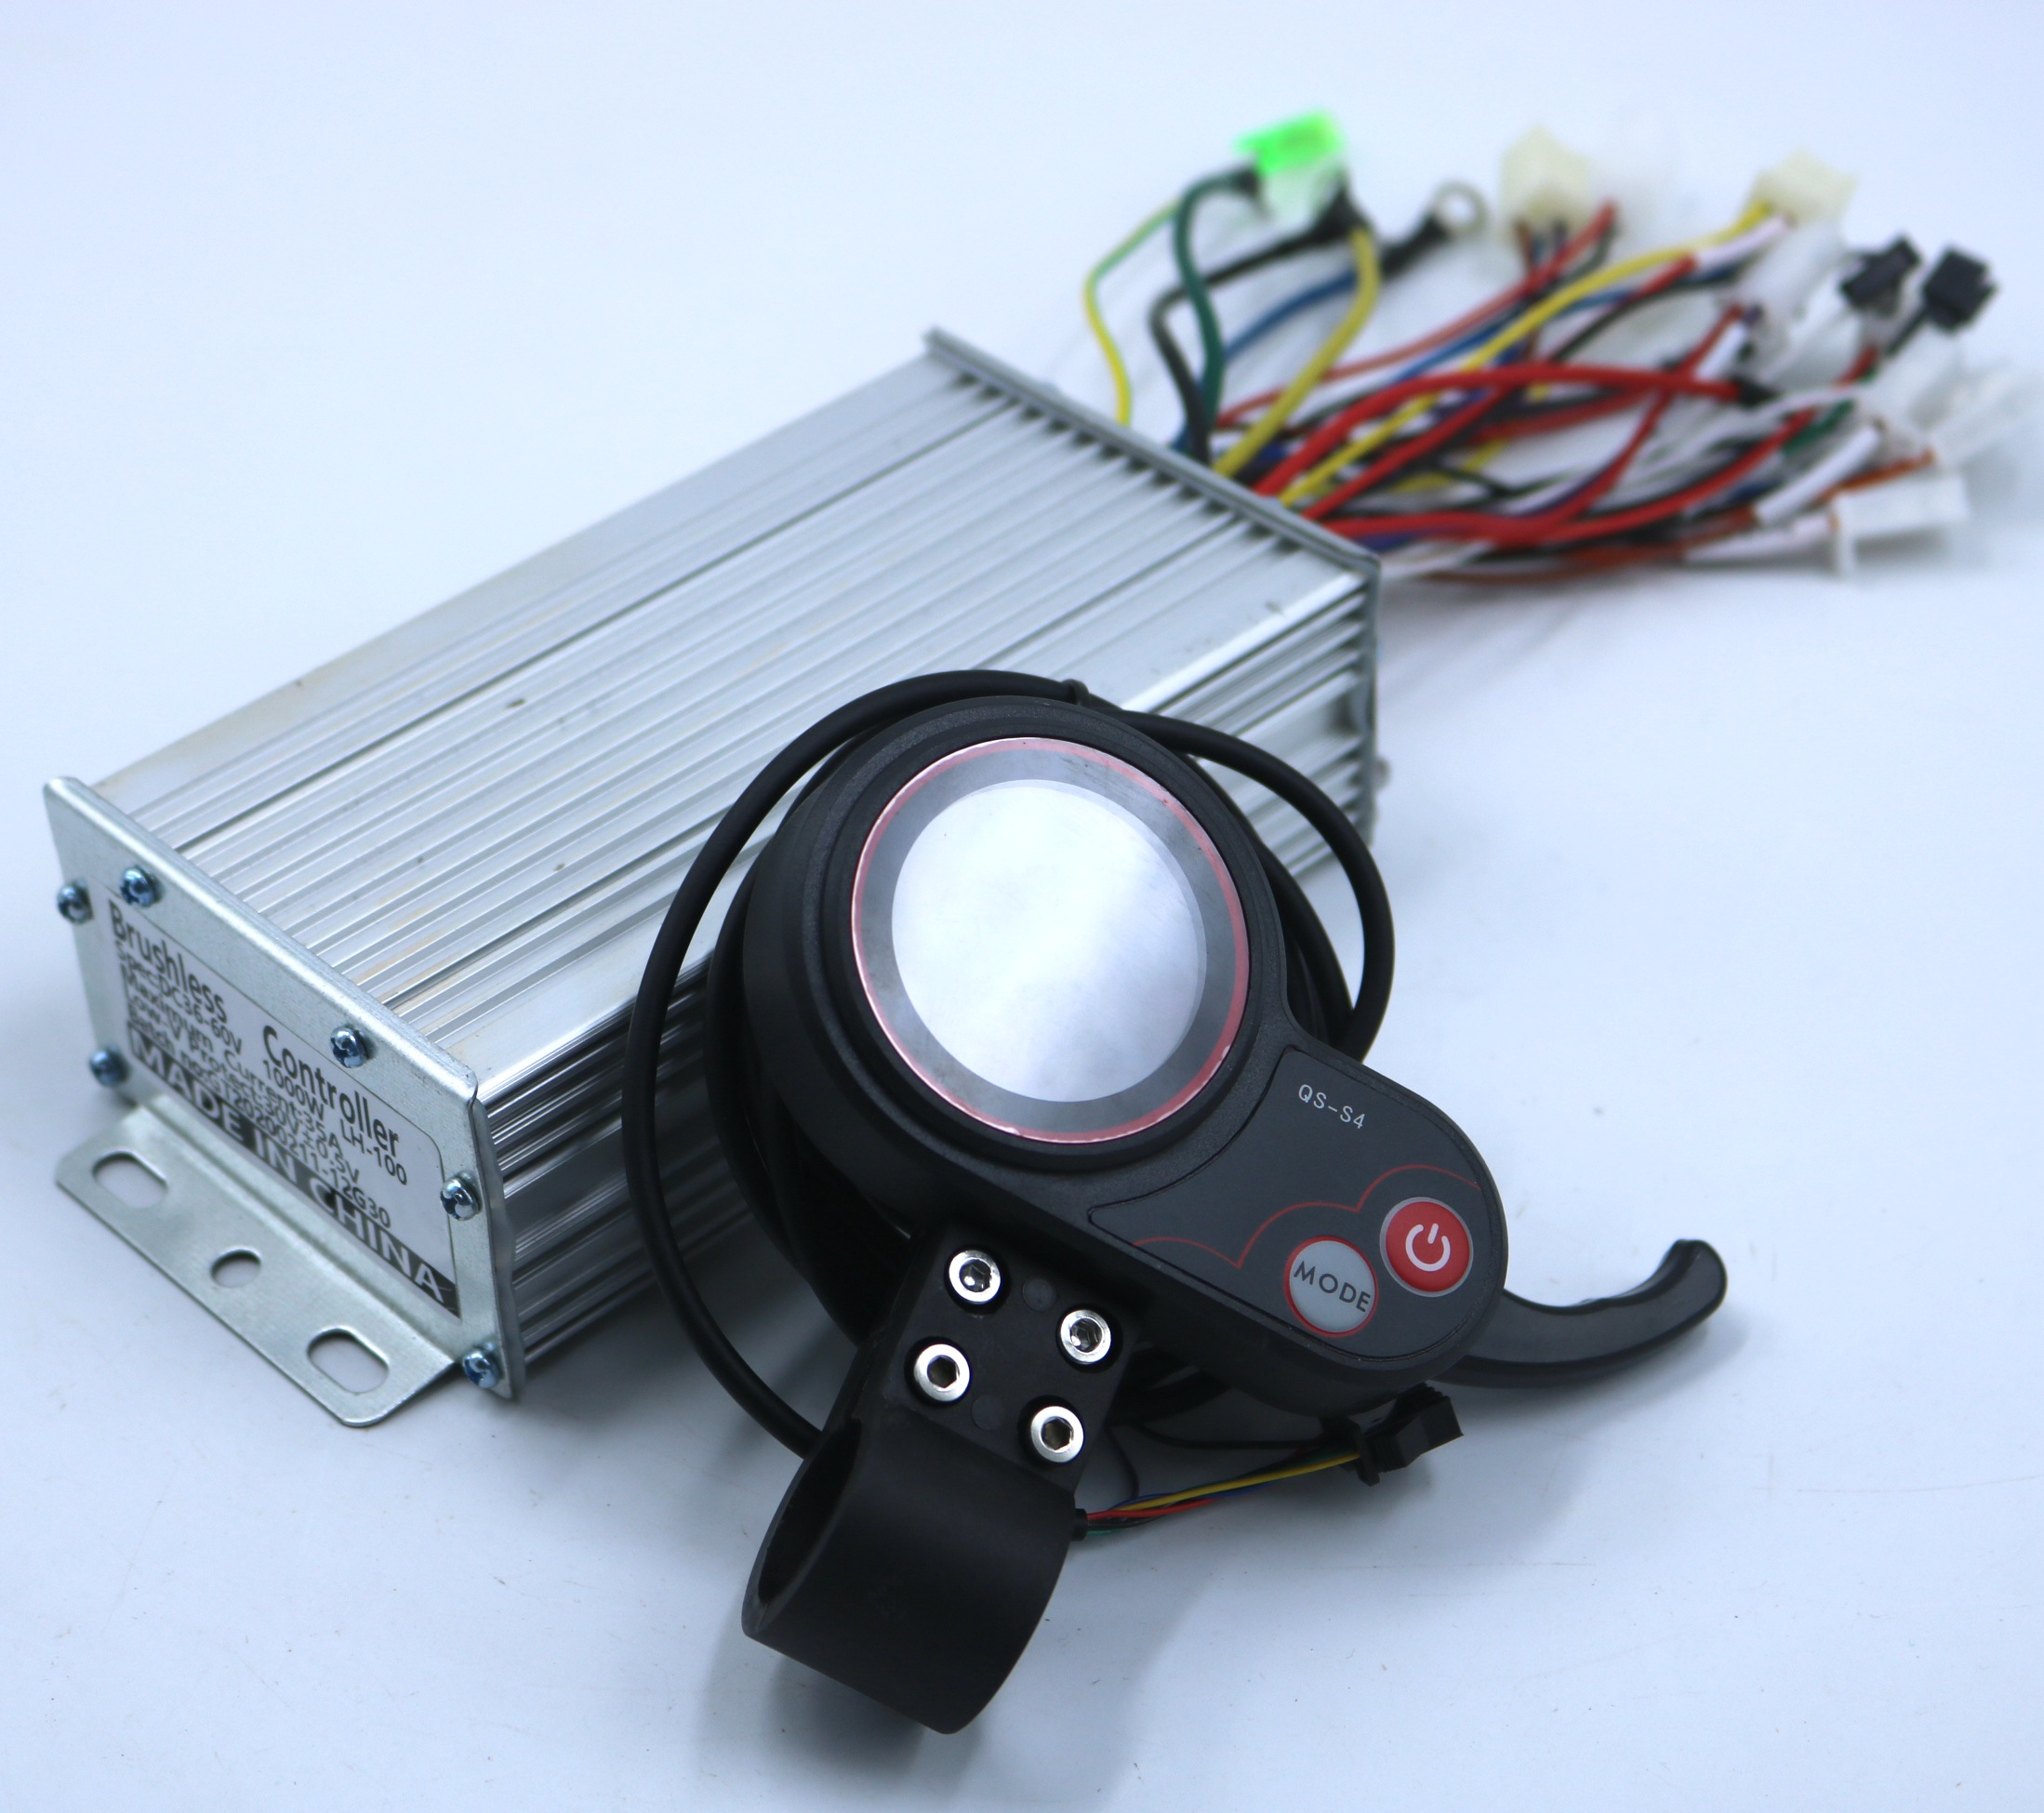 GREENTIME 36 V/48 V/60 V 800/1000W BLDC ไฟฟ้าสกู๊ตเตอร์ควบคุม E-BIKE ความเร็ว DRIVER และ QS-S4 จอแสดงผล LCD หนึ่งชุด